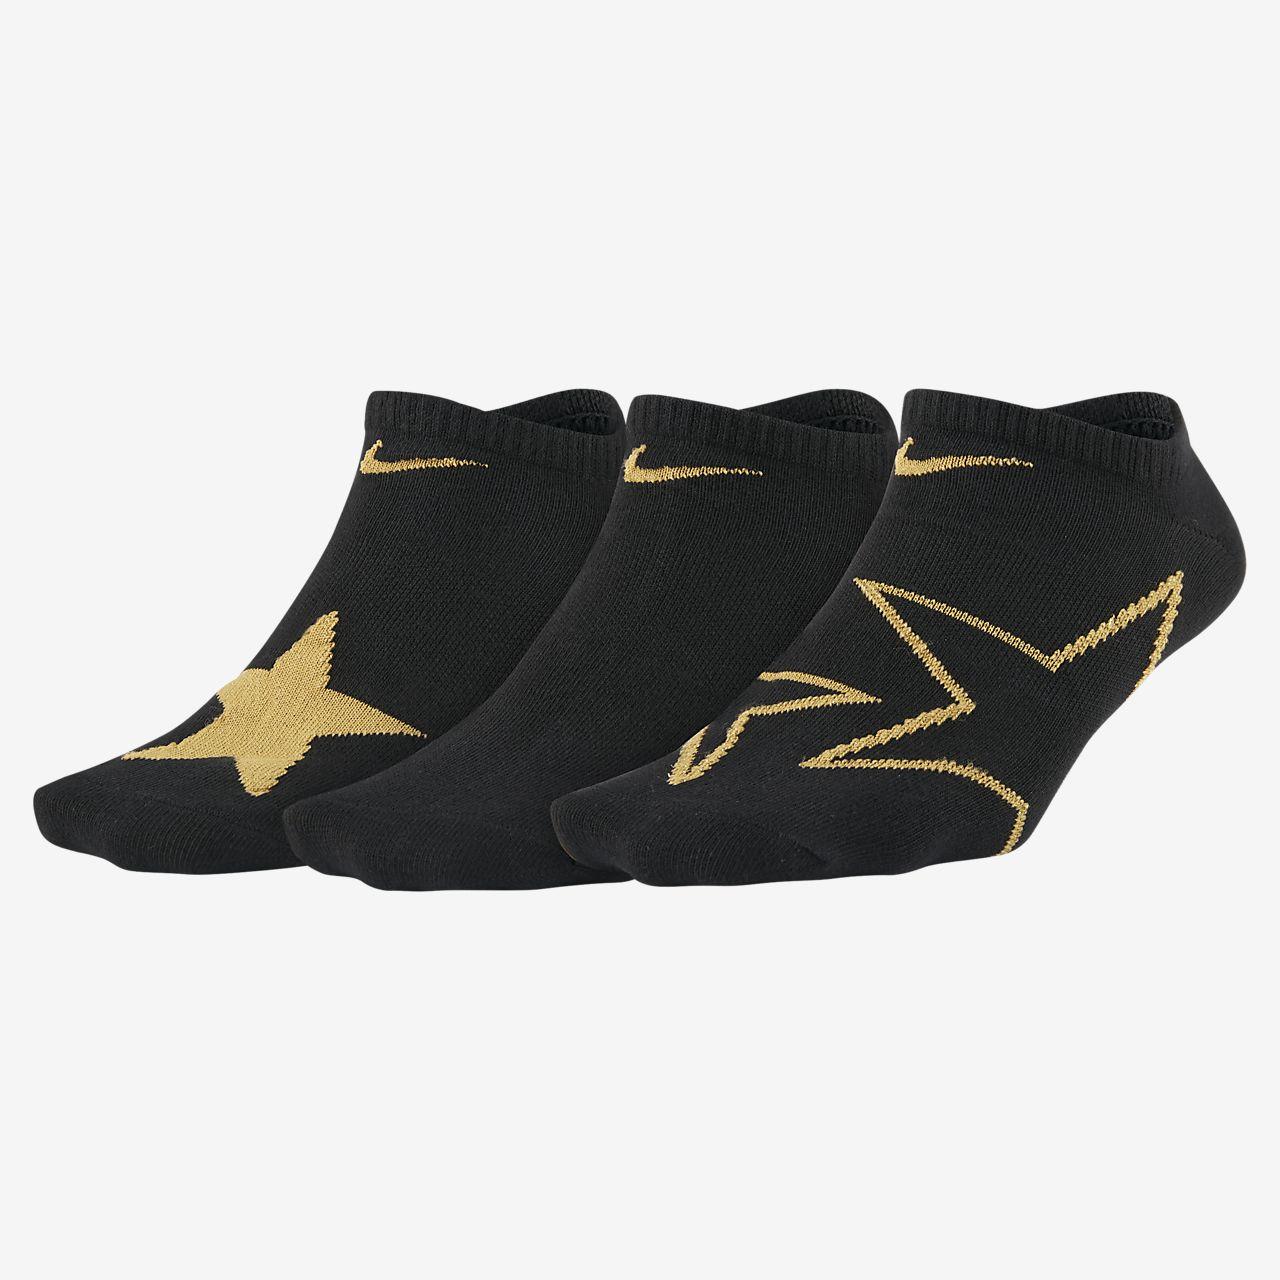 Nike Everyday Big Kids' Graphic No-Show Socks (3 Pairs)